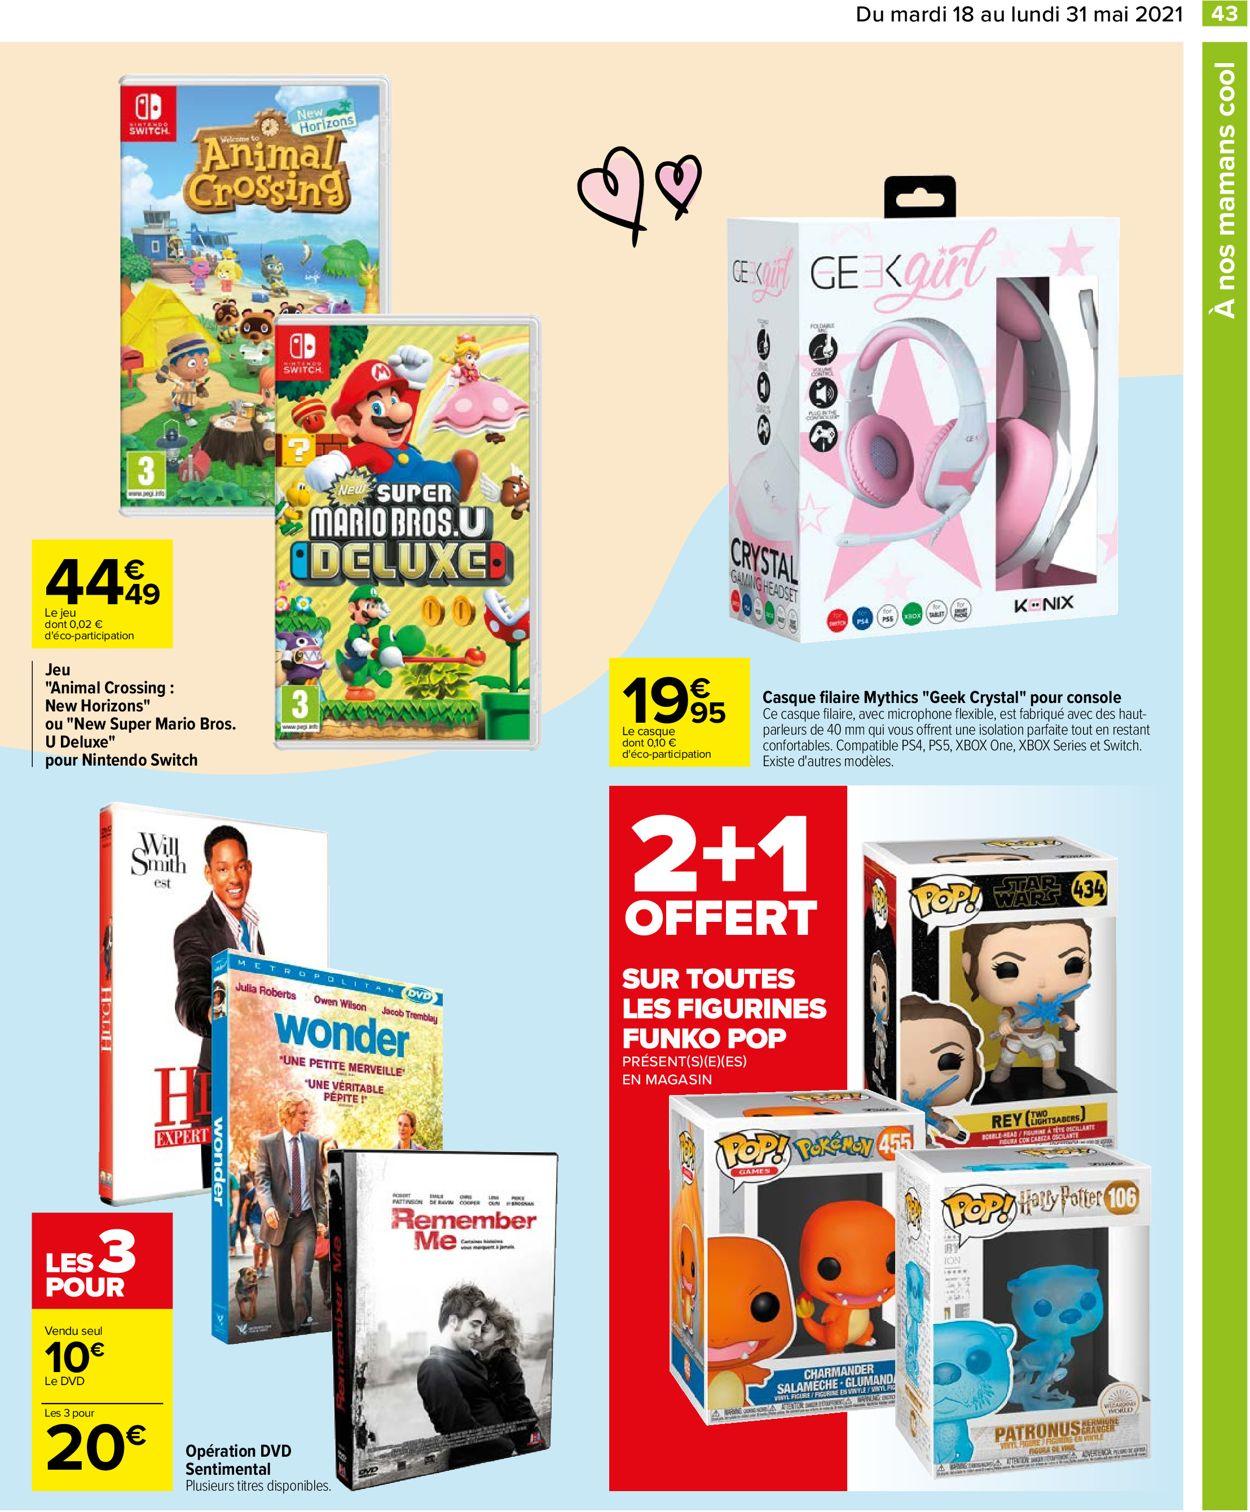 Carrefour Catalogue - 18.05-31.05.2021 (Page 43)